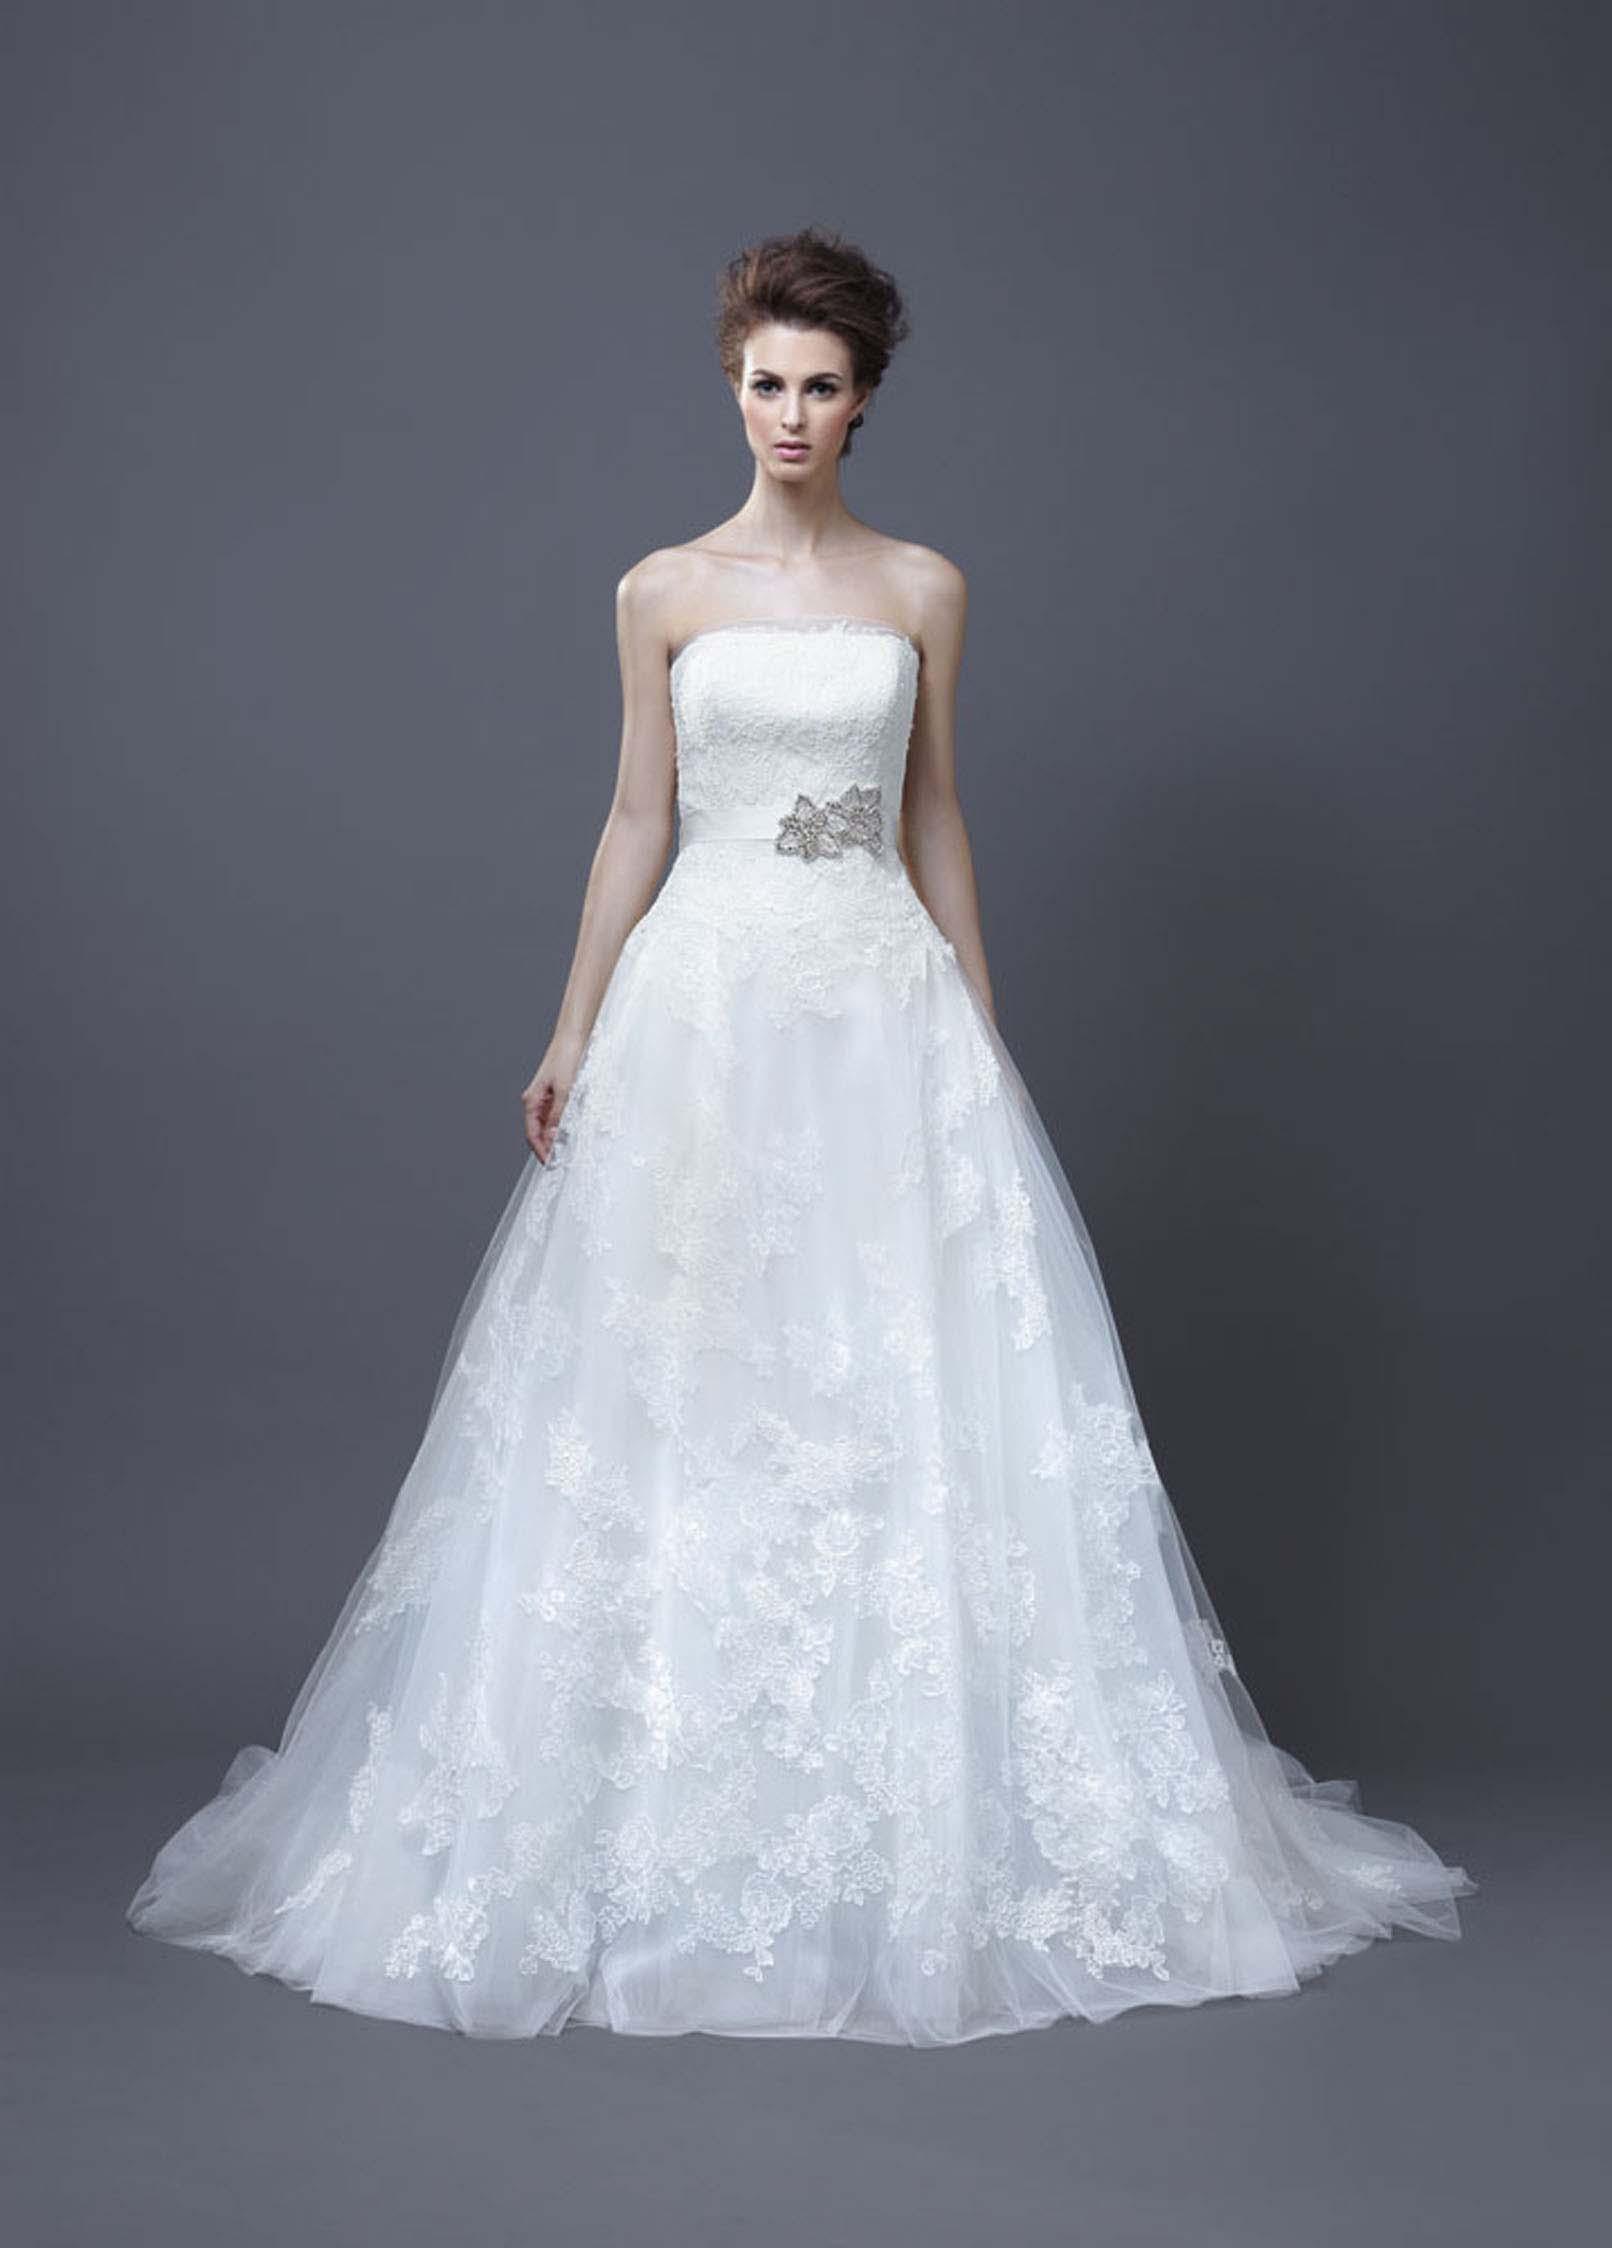 Halo Wedding Dresses 121